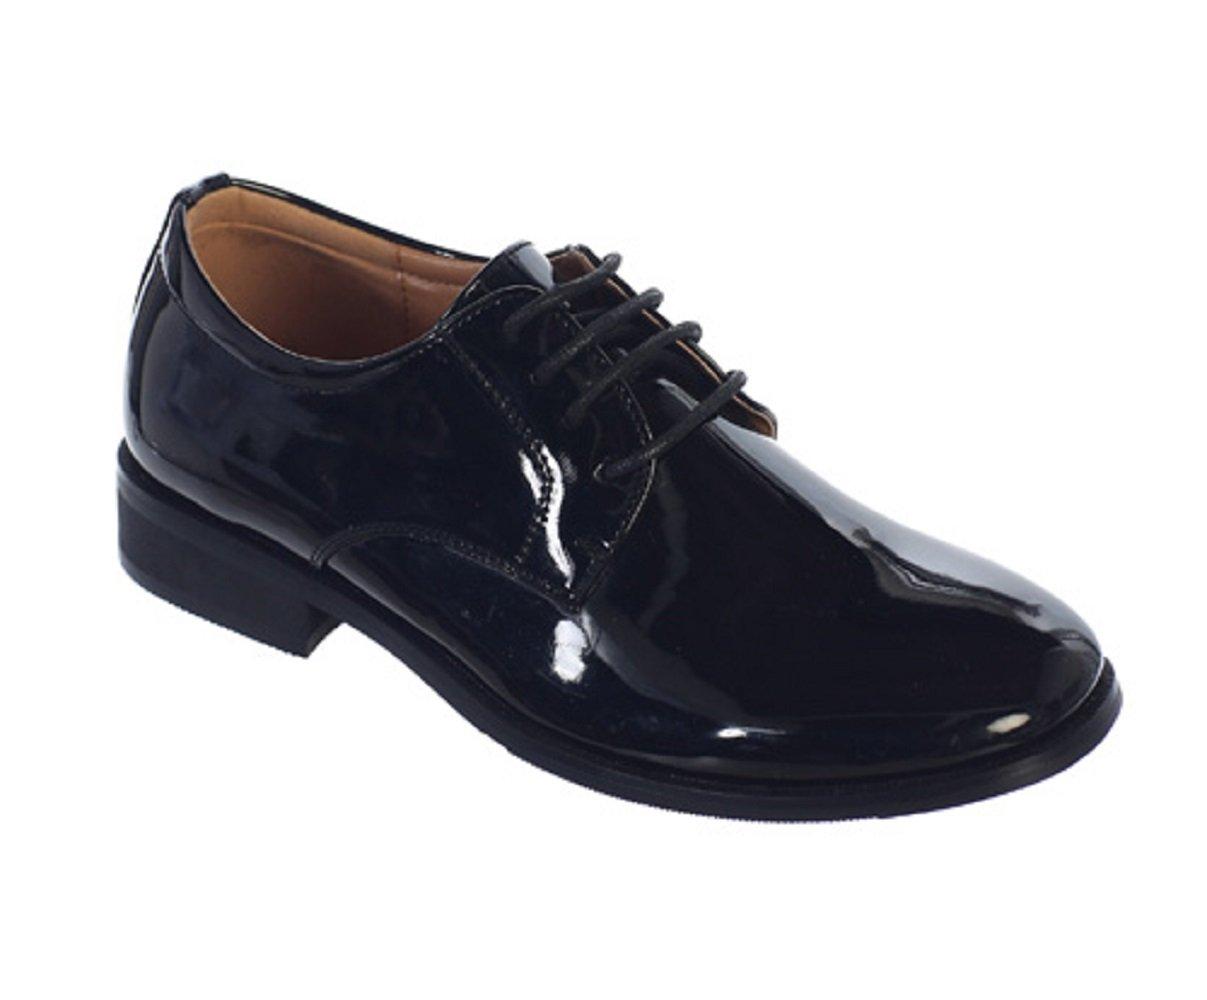 OLIVIA KOO Boys Classic Oxford Shiny Dress Shoes (Size 5 To Youth 5)